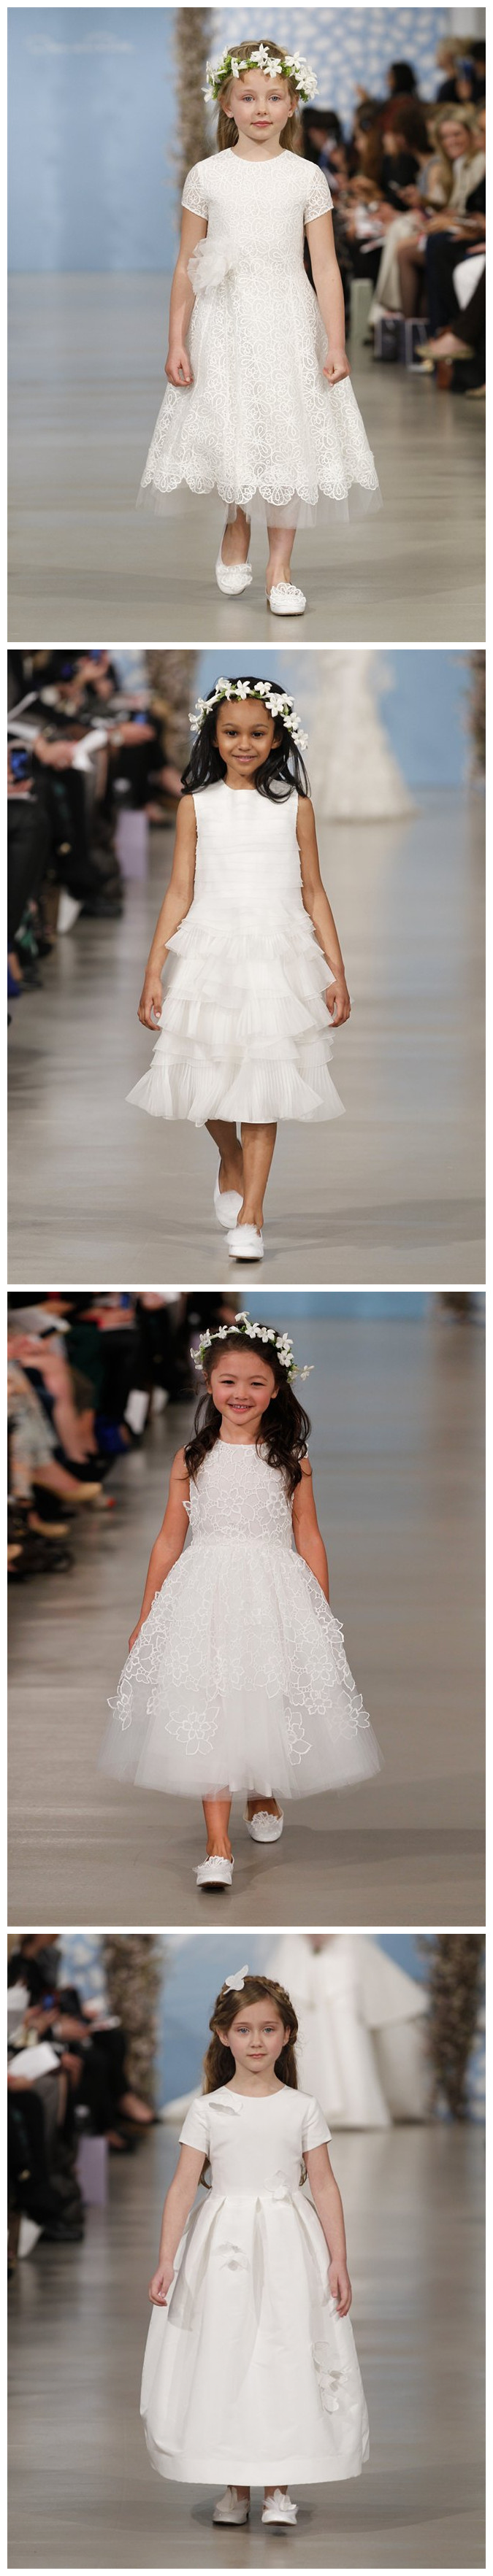 Robe cortége fille blanche de Oscar de la Renda printemps 2014